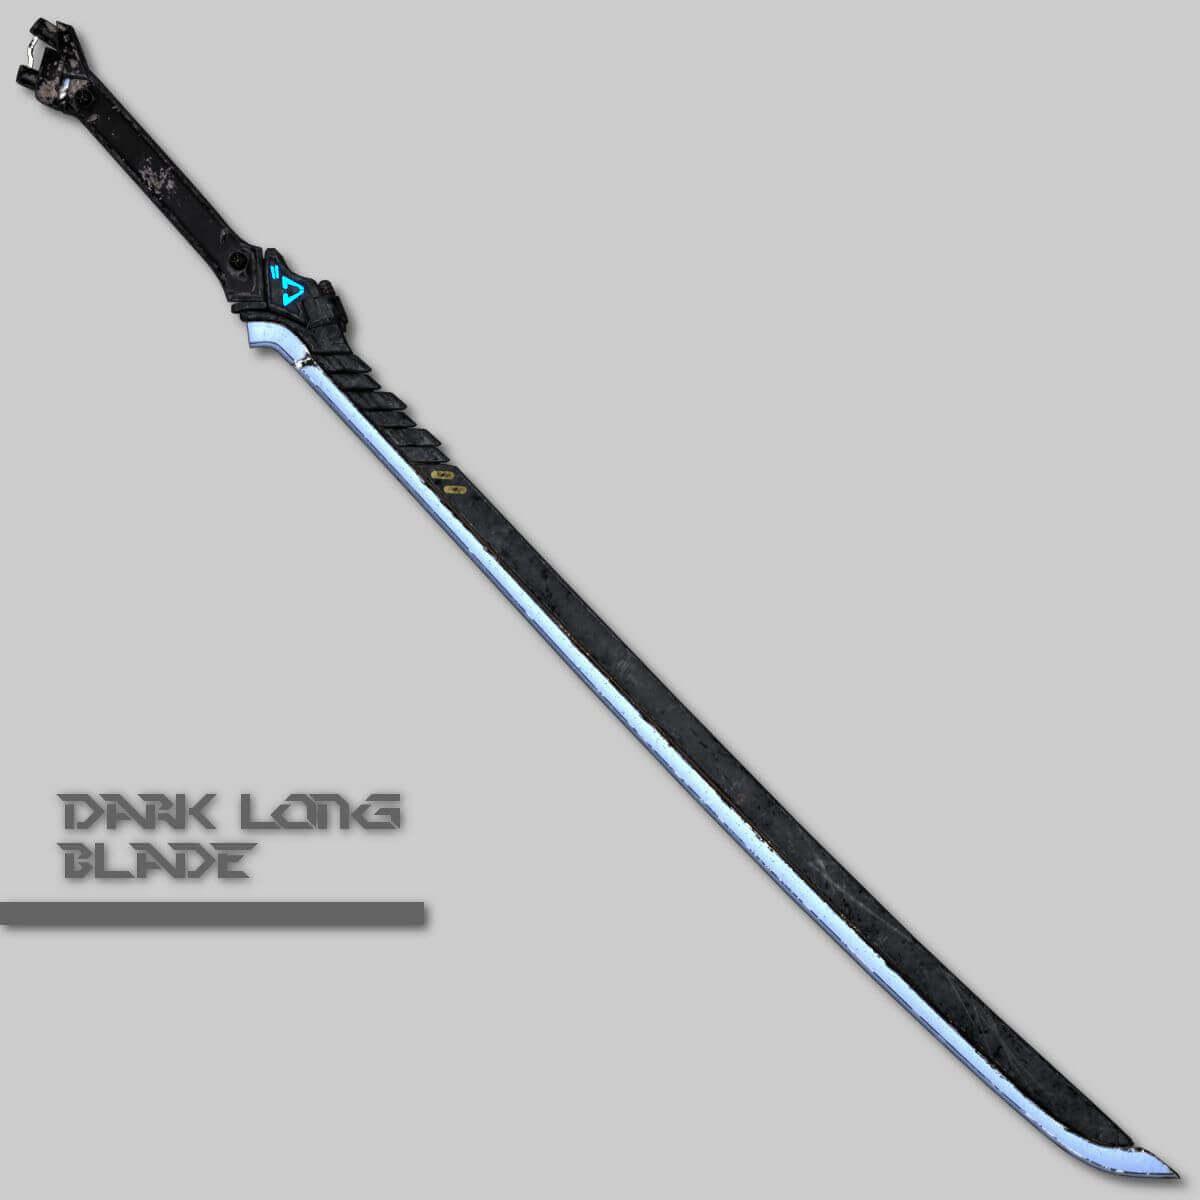 Sci Fi Swords Pack 3d Model